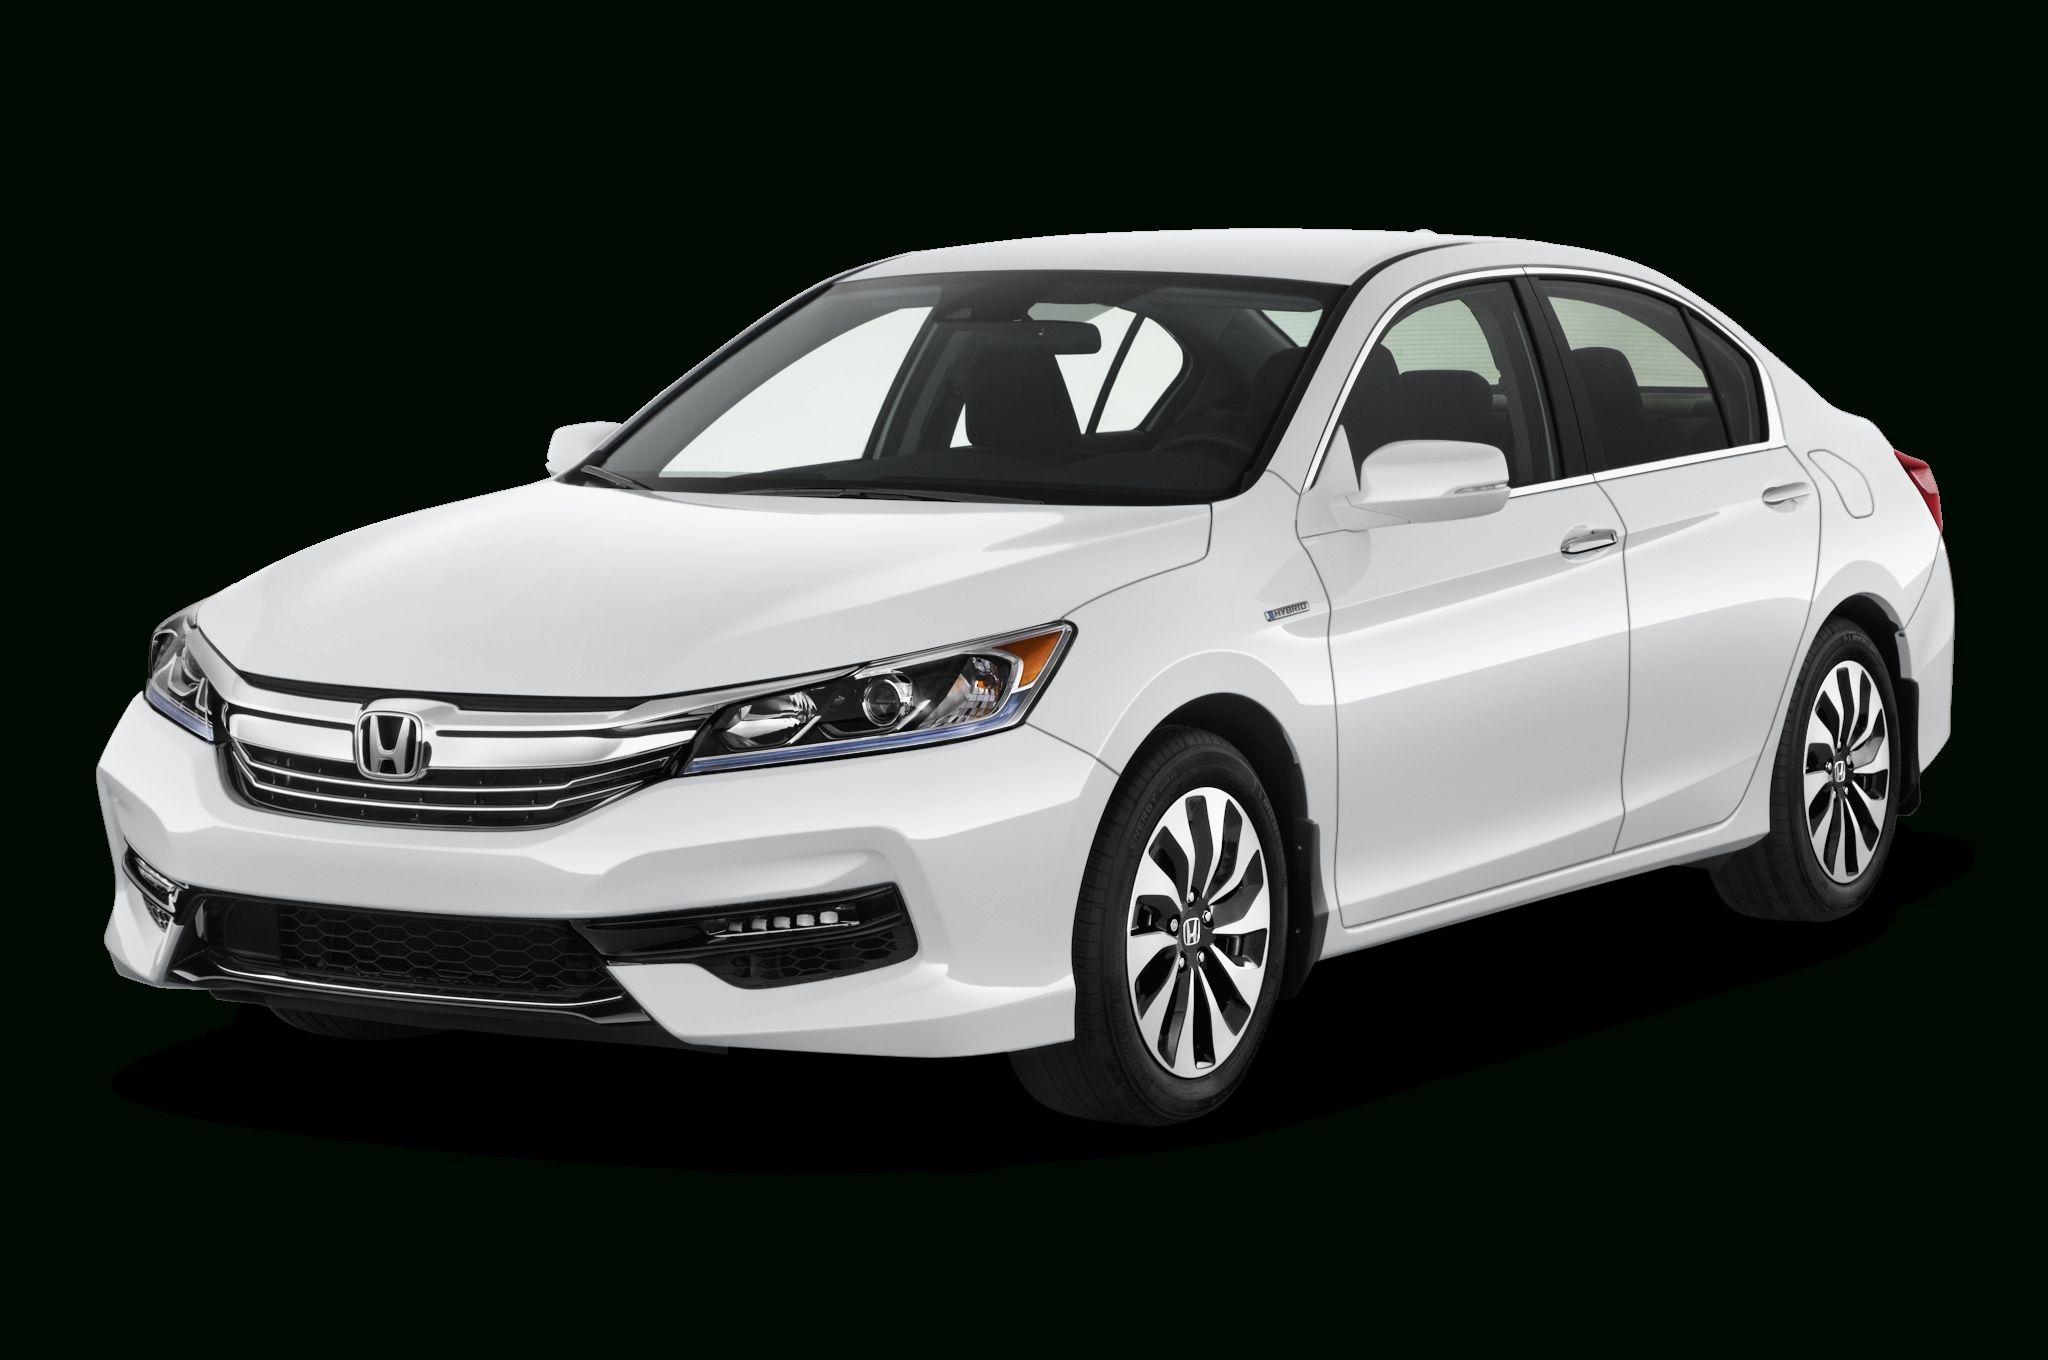 Honda accord type R 2019 awd (con imágenes) Autos, Coches